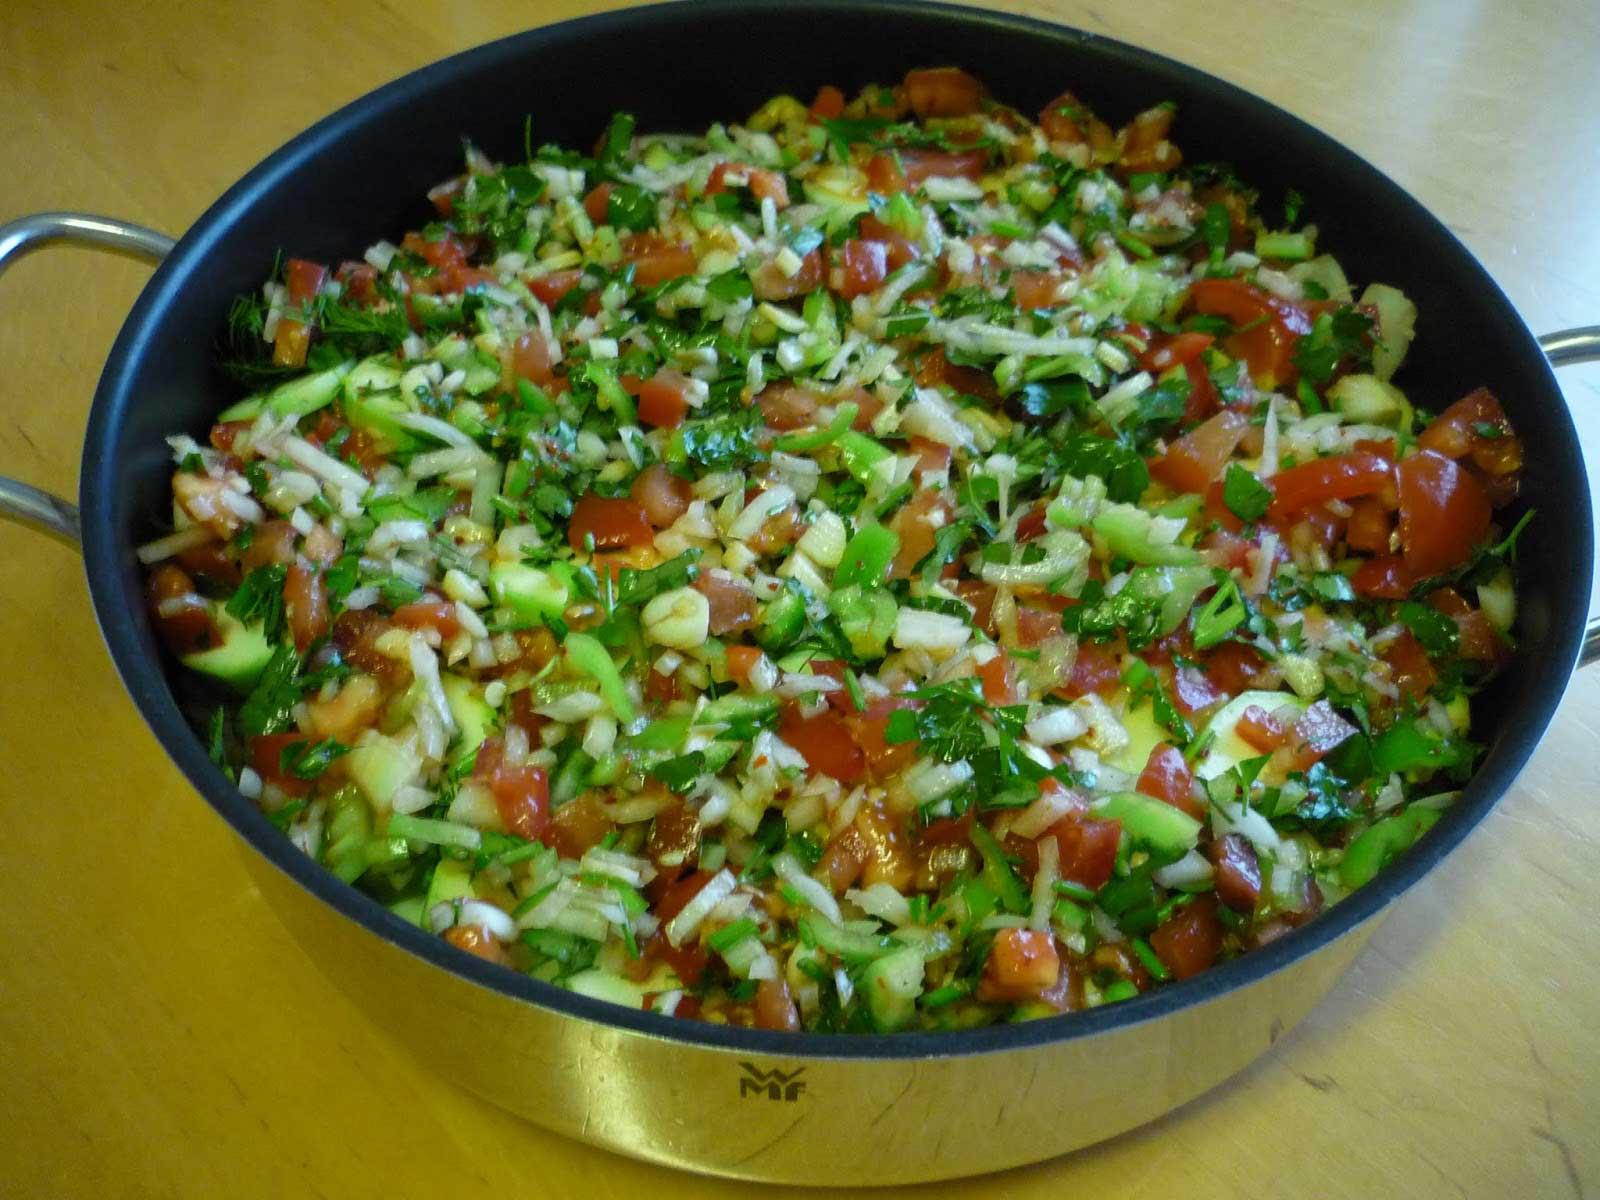 Zucchini und Auberginen mit Olivenöl - Zeytinyağlı Kabak ve Patlıcan